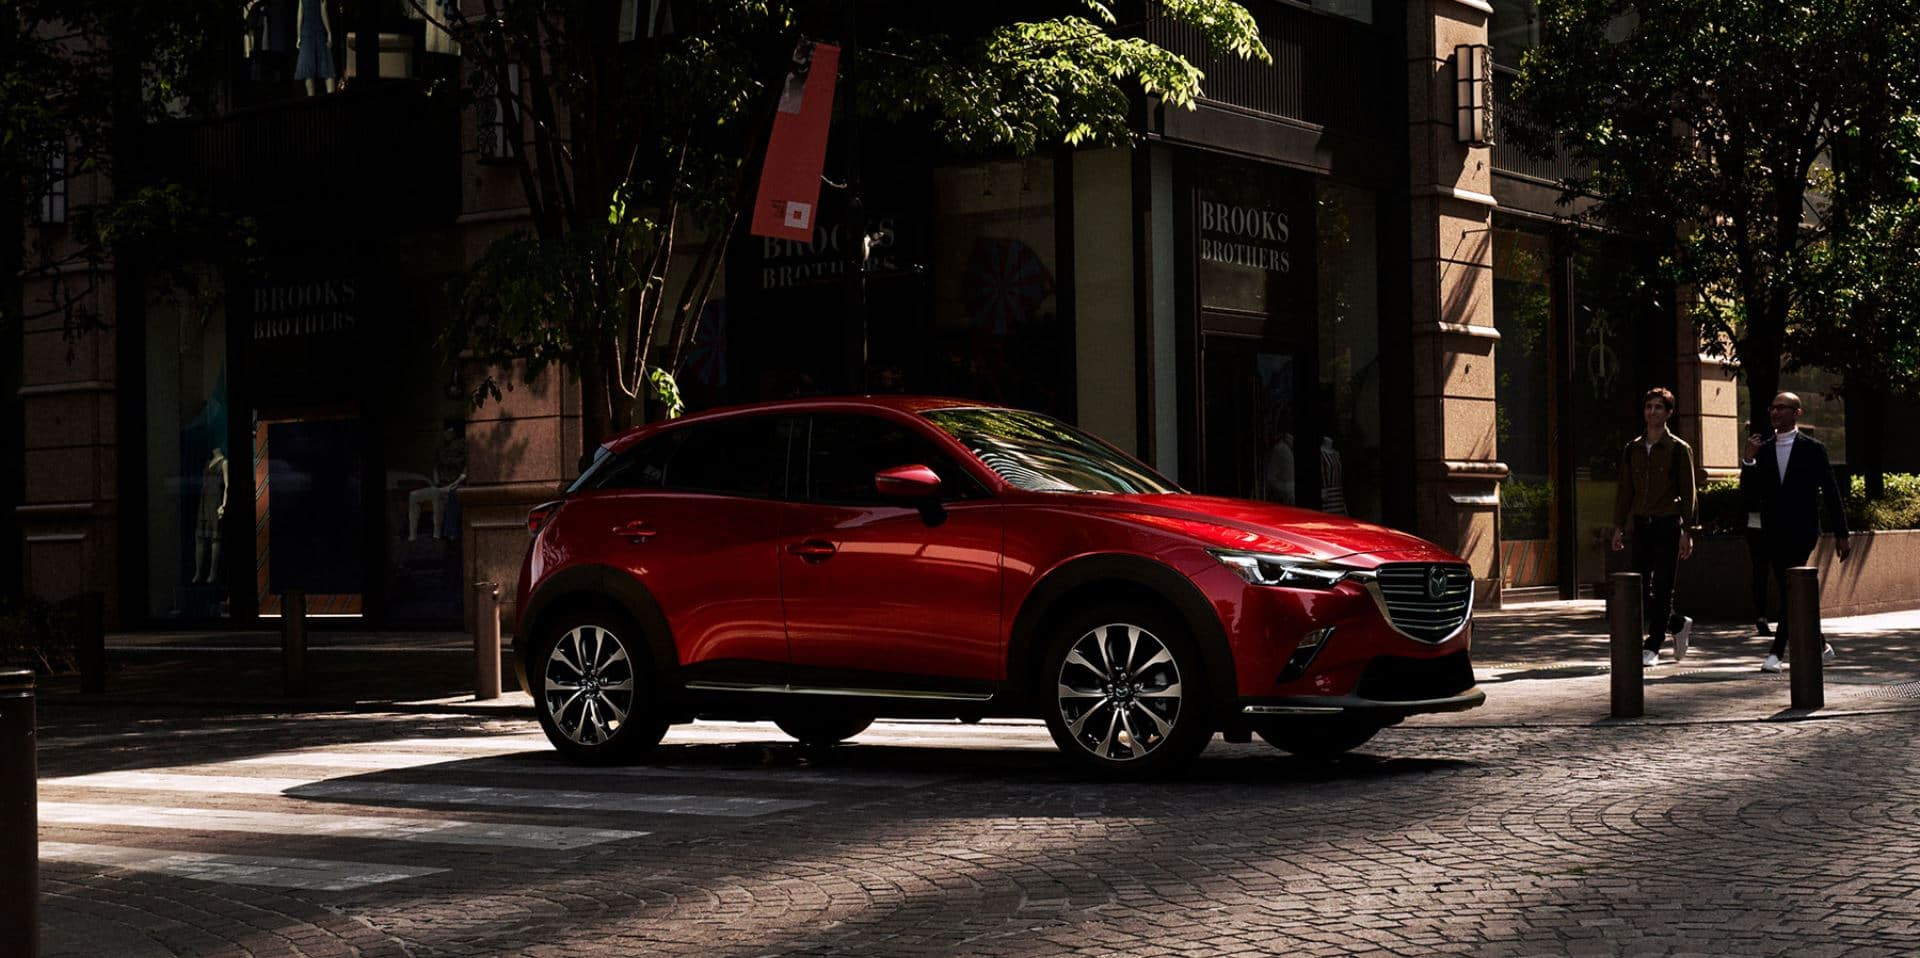 2020 Mazda CX-30 red exterior